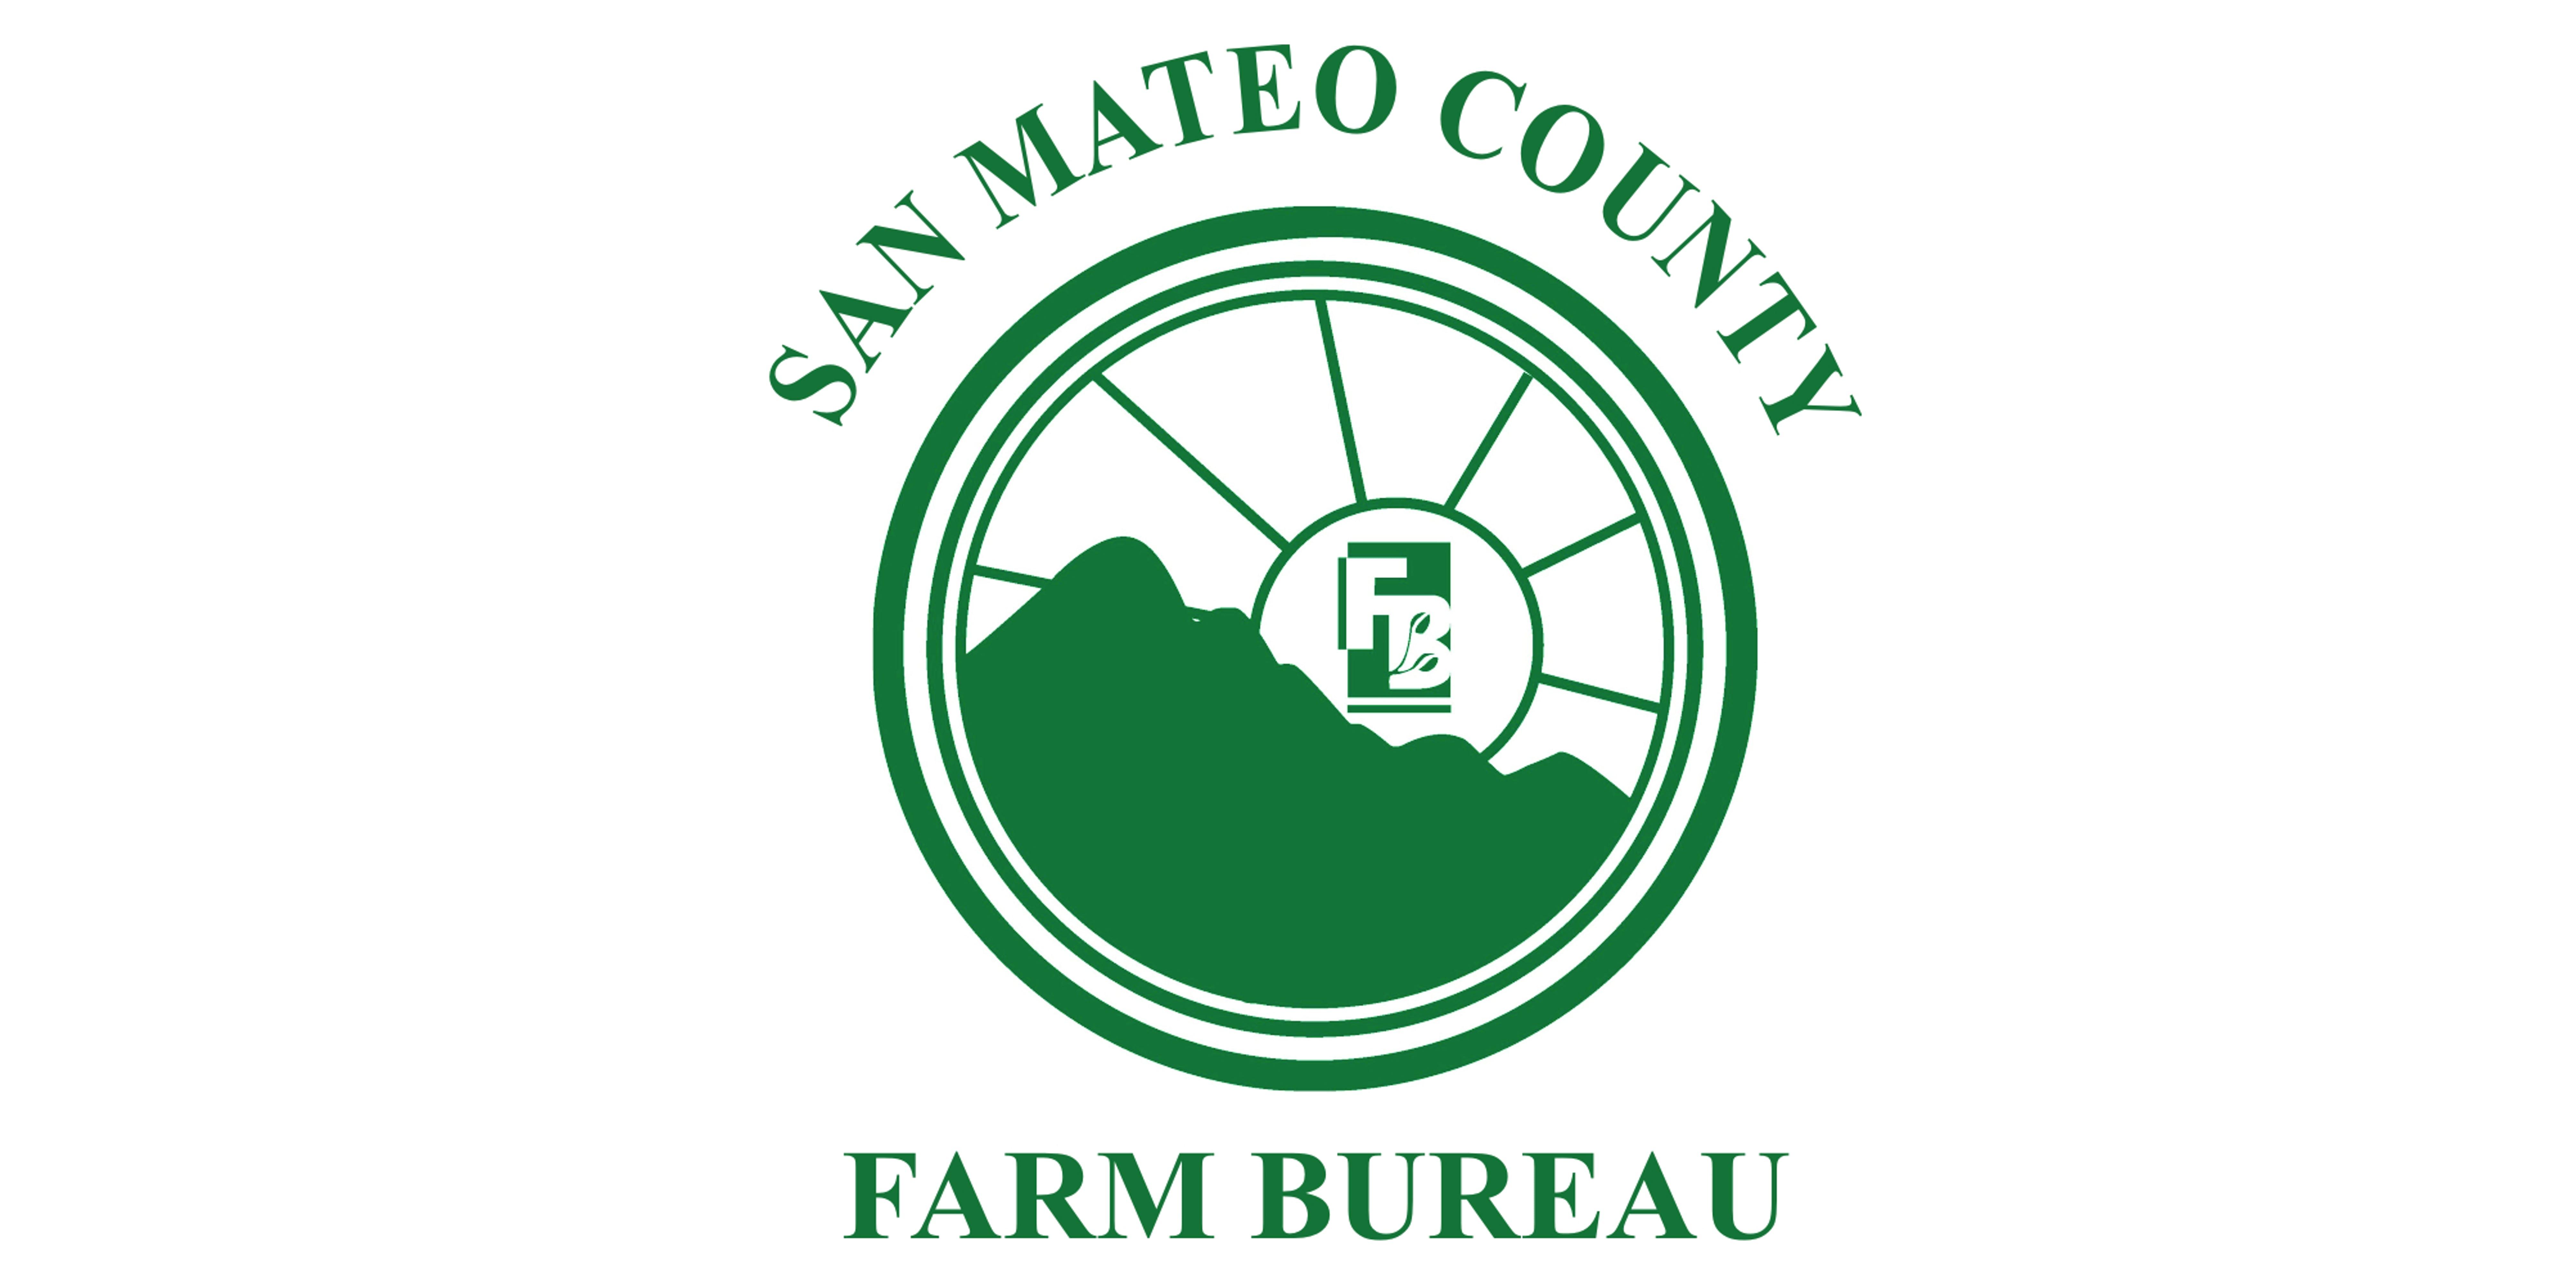 San Mateo County Farm Bureau Golf Tournament 2019 24 Jun 2019